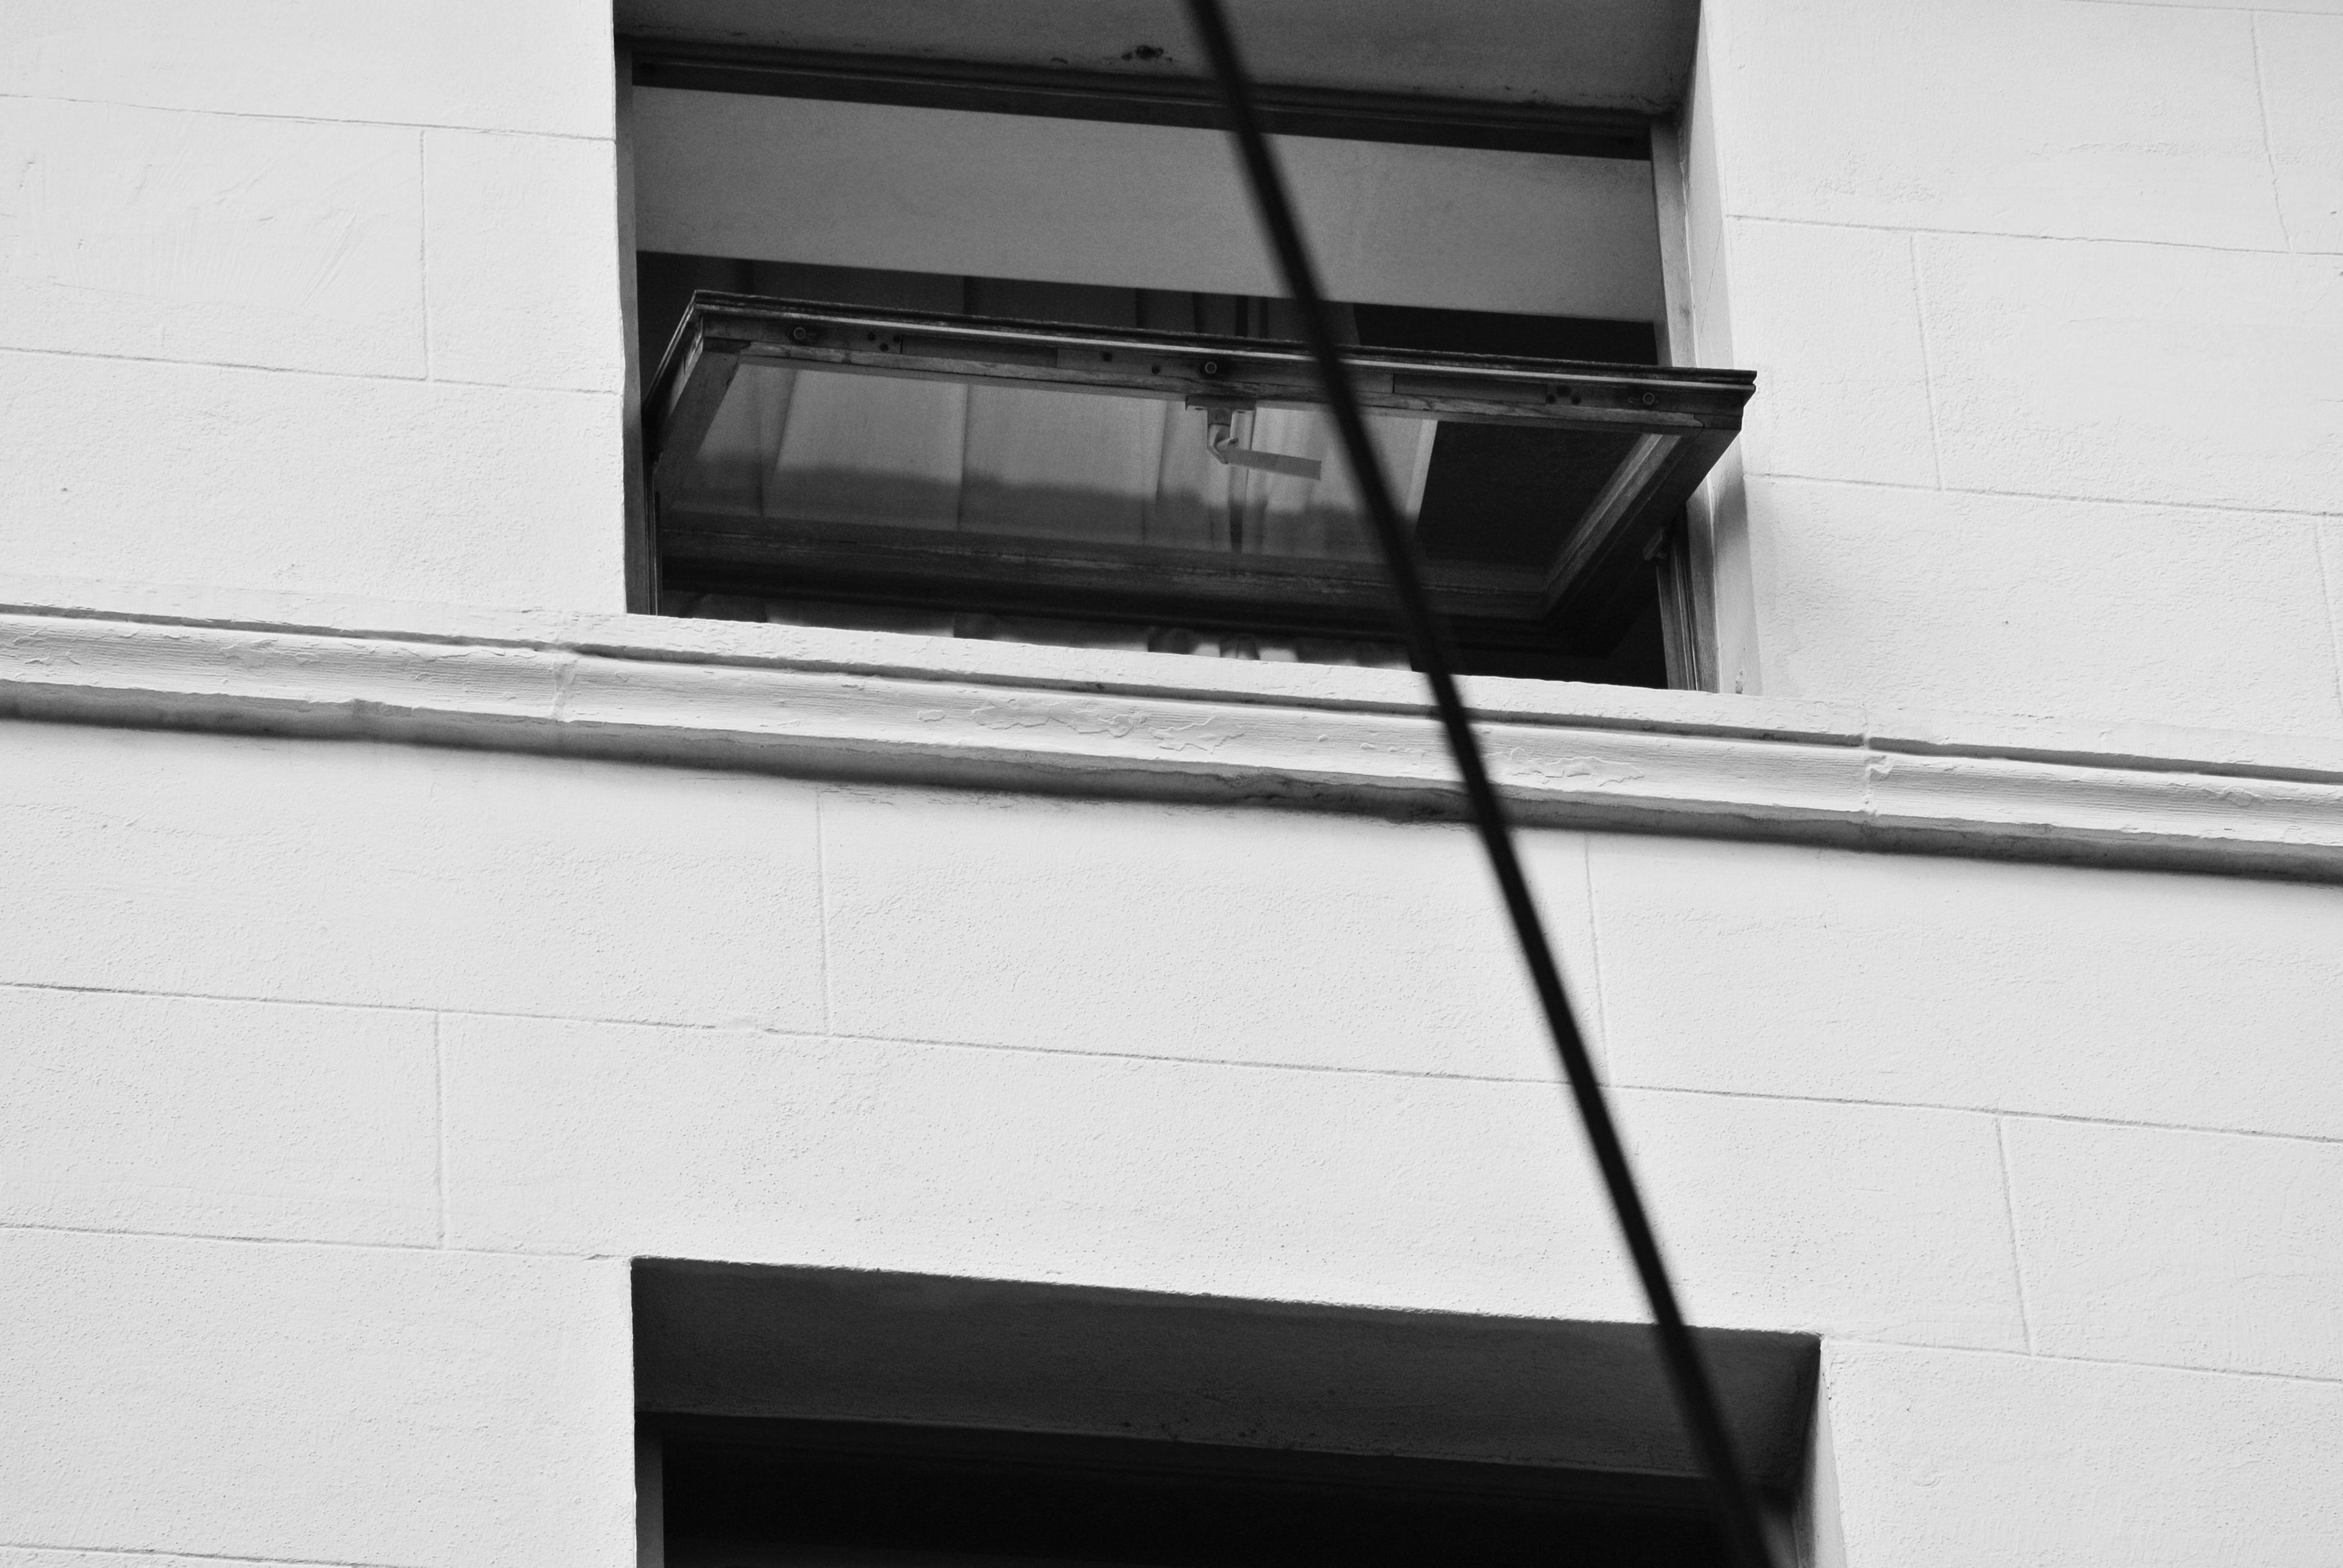 en blanco y negro blanco casa piso ventana pared lnea fachada azulejo negro mueble monocromo